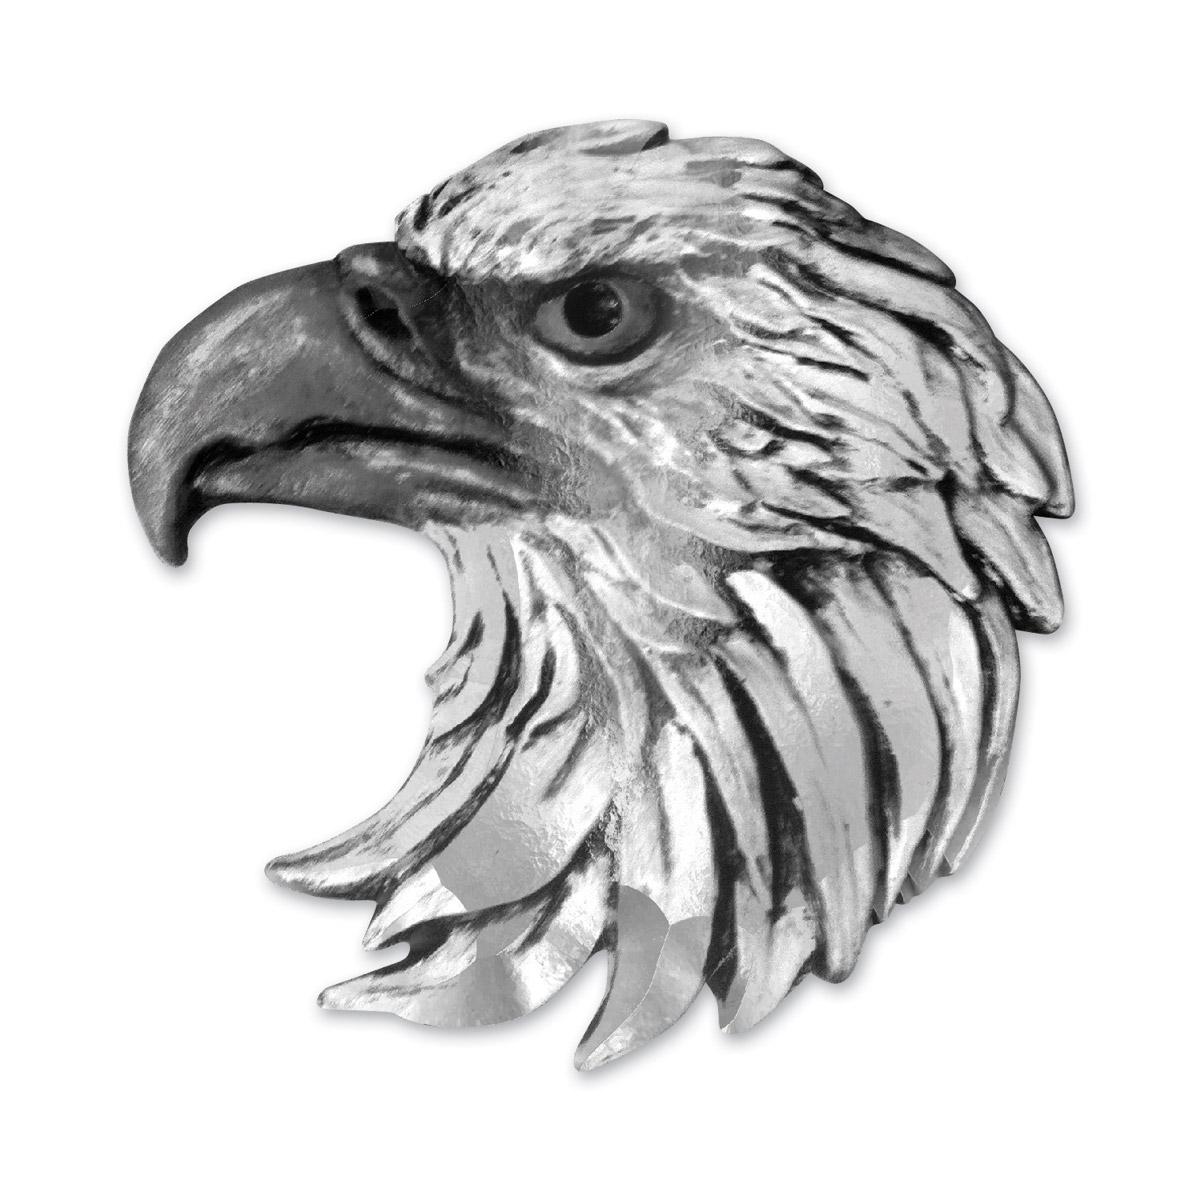 Lethal Threat Eagle Head 3-D Emblem